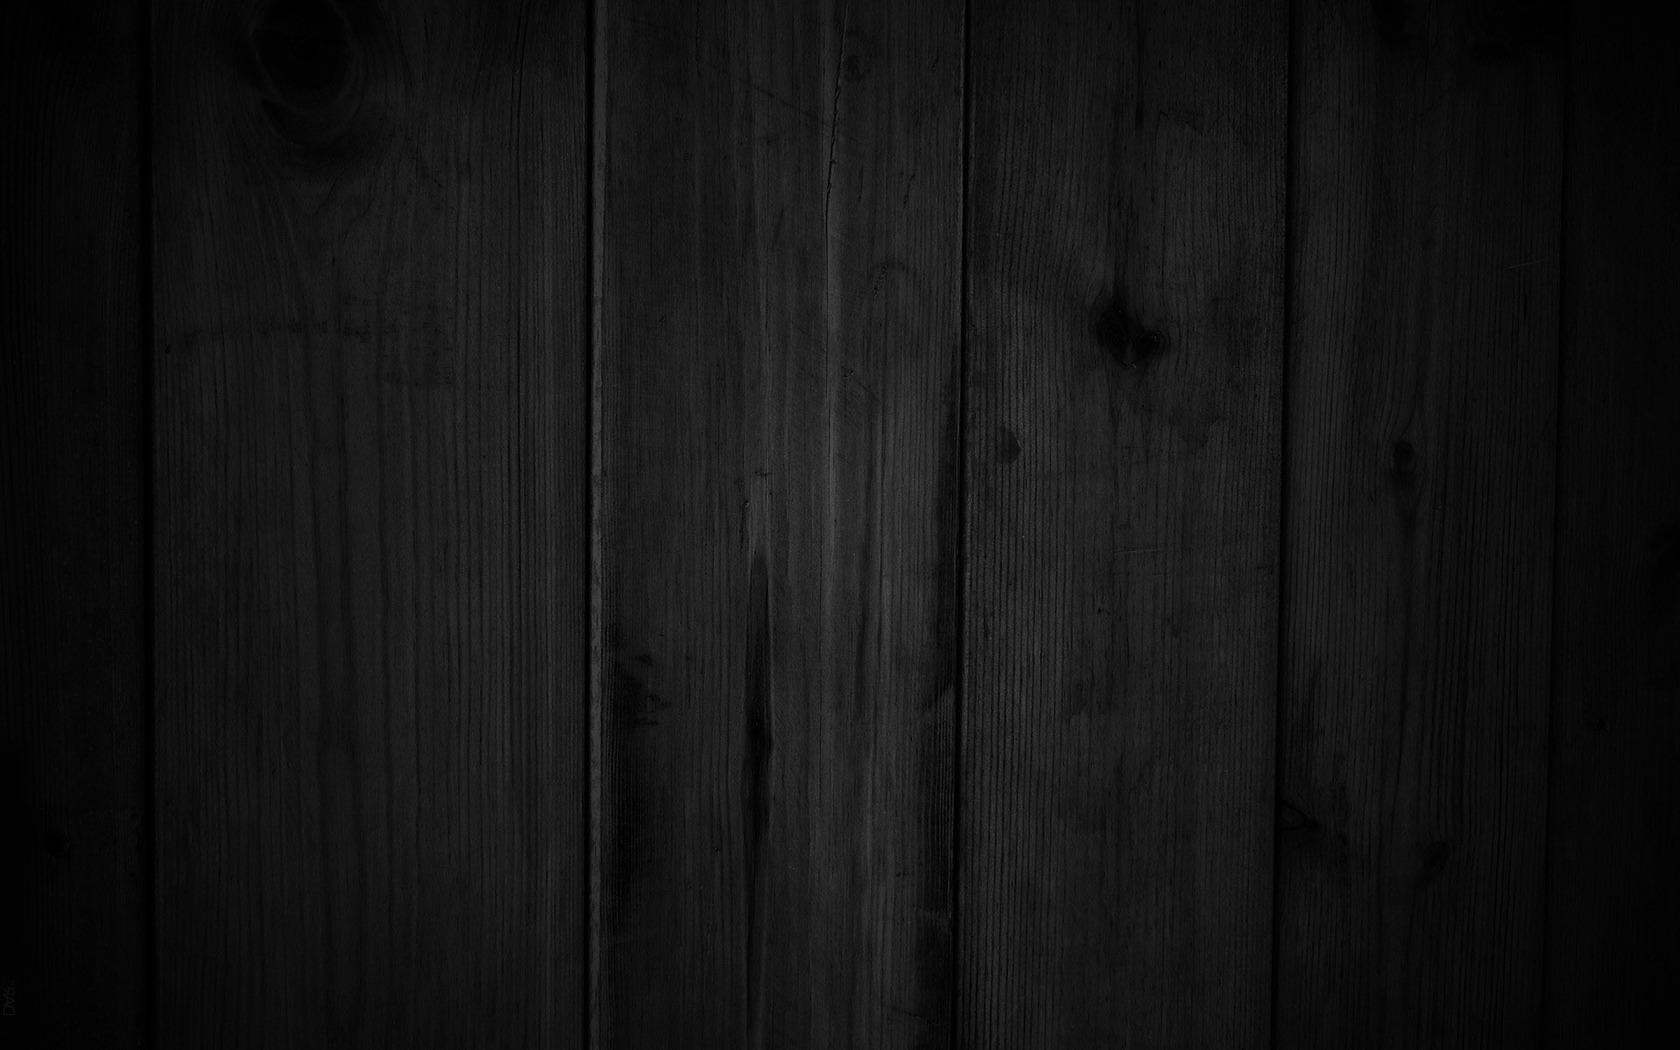 ... Grey wood 1680x1050 wallpaper ...